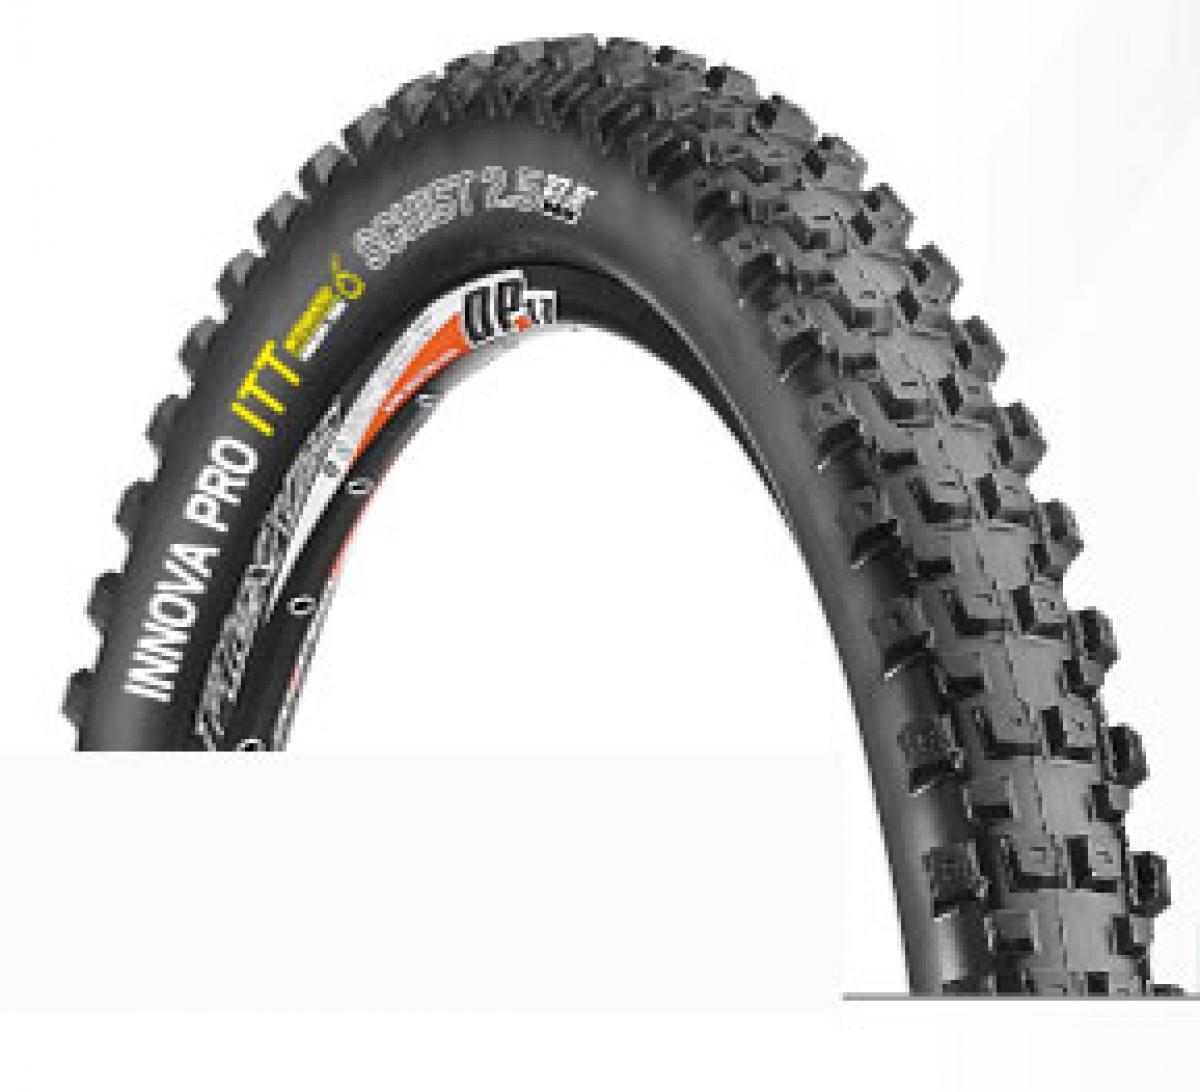 Innova Pro ITT S st 27.5 x 2.5   MTB Tire Integrated Tubeless 60TPI Tech 1185g  cheap designer brands